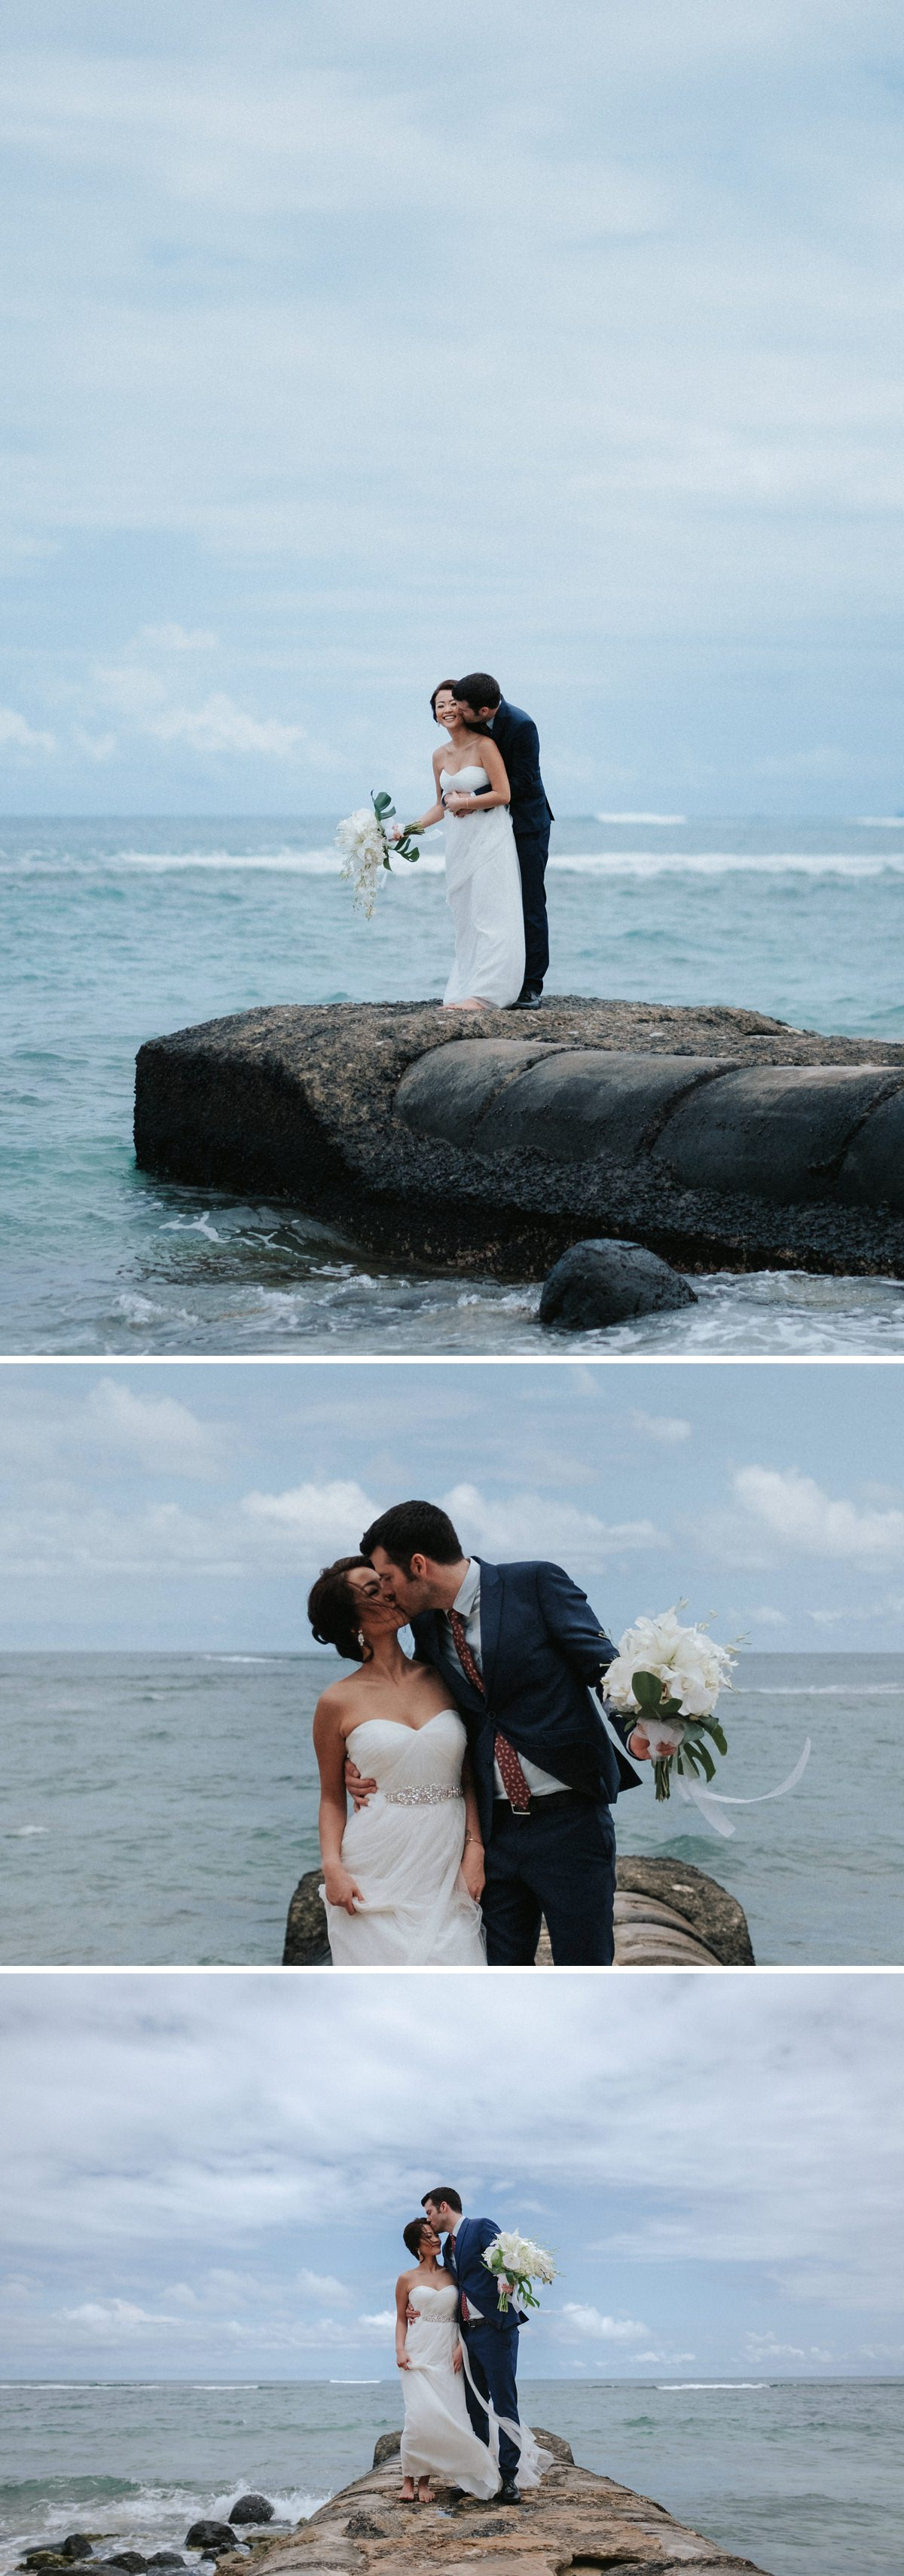 Bride and groom portrait in Hawaii